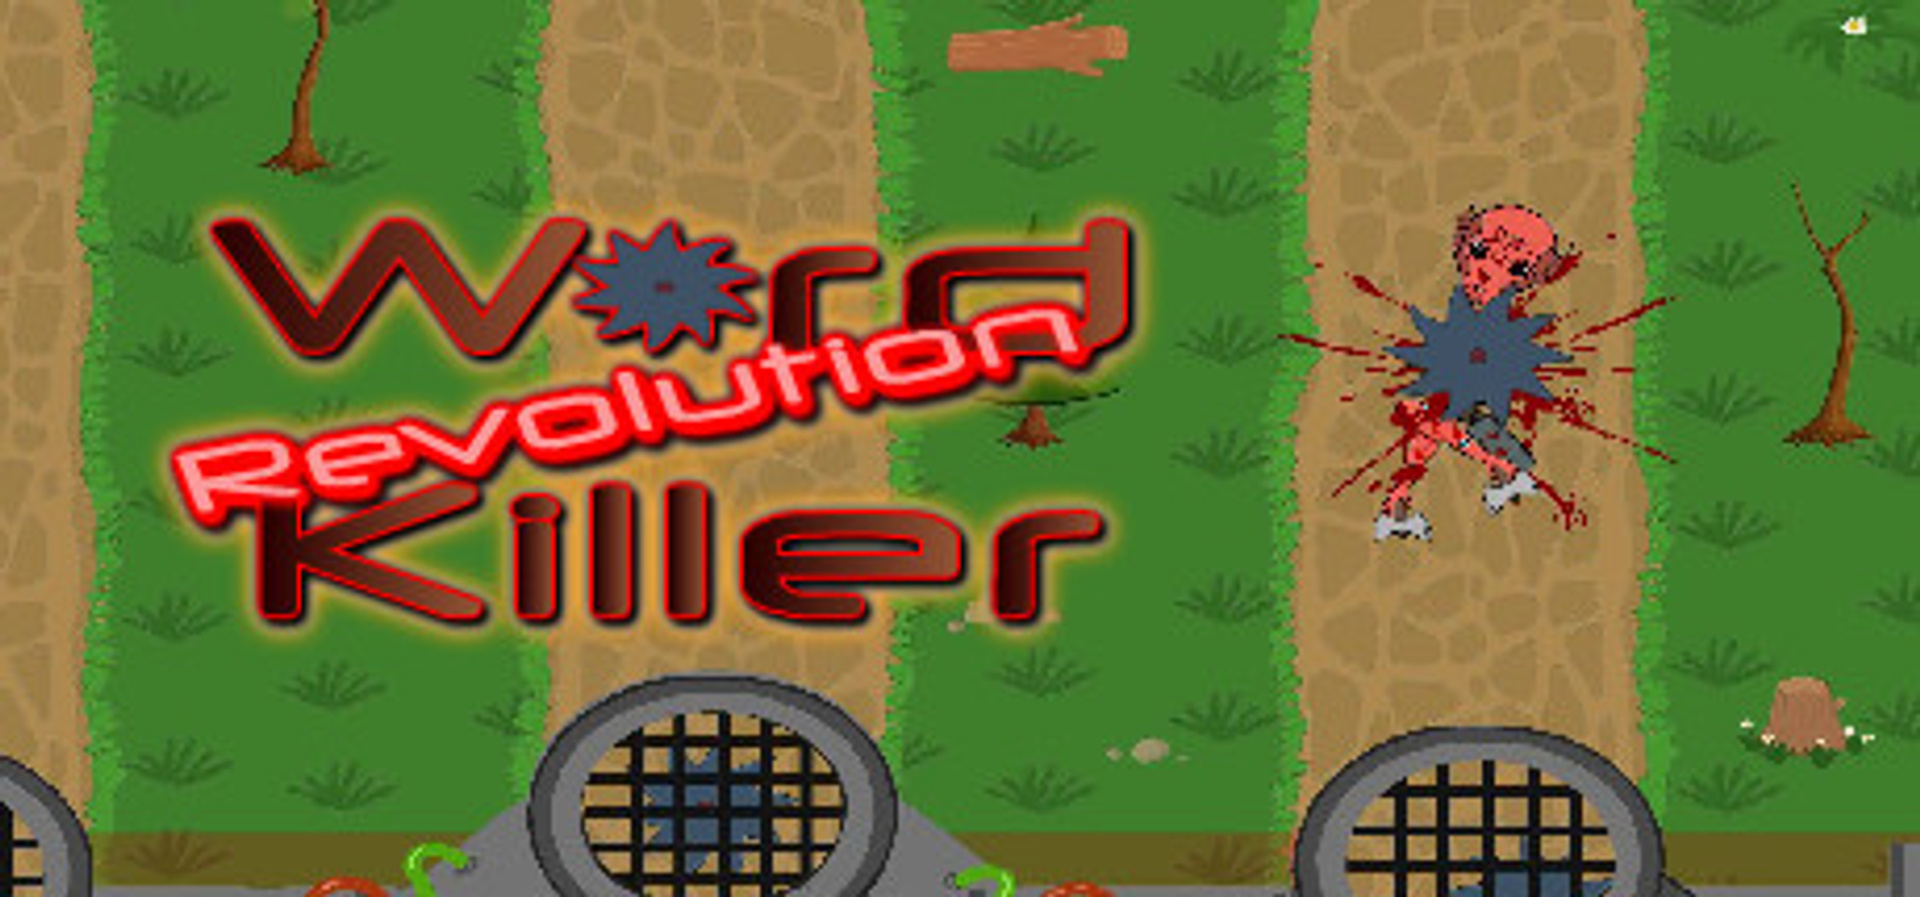 buy Word Killer: Revolution cd key for pc platform